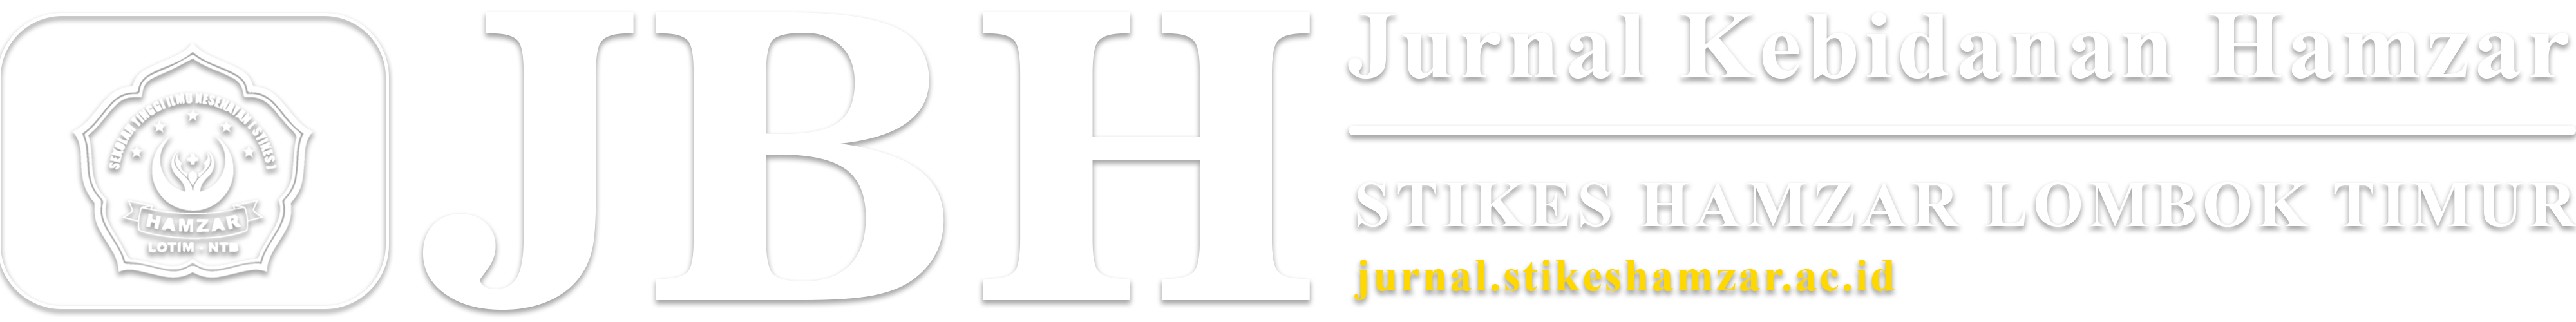 Jurnal Kebidanan Hamzar